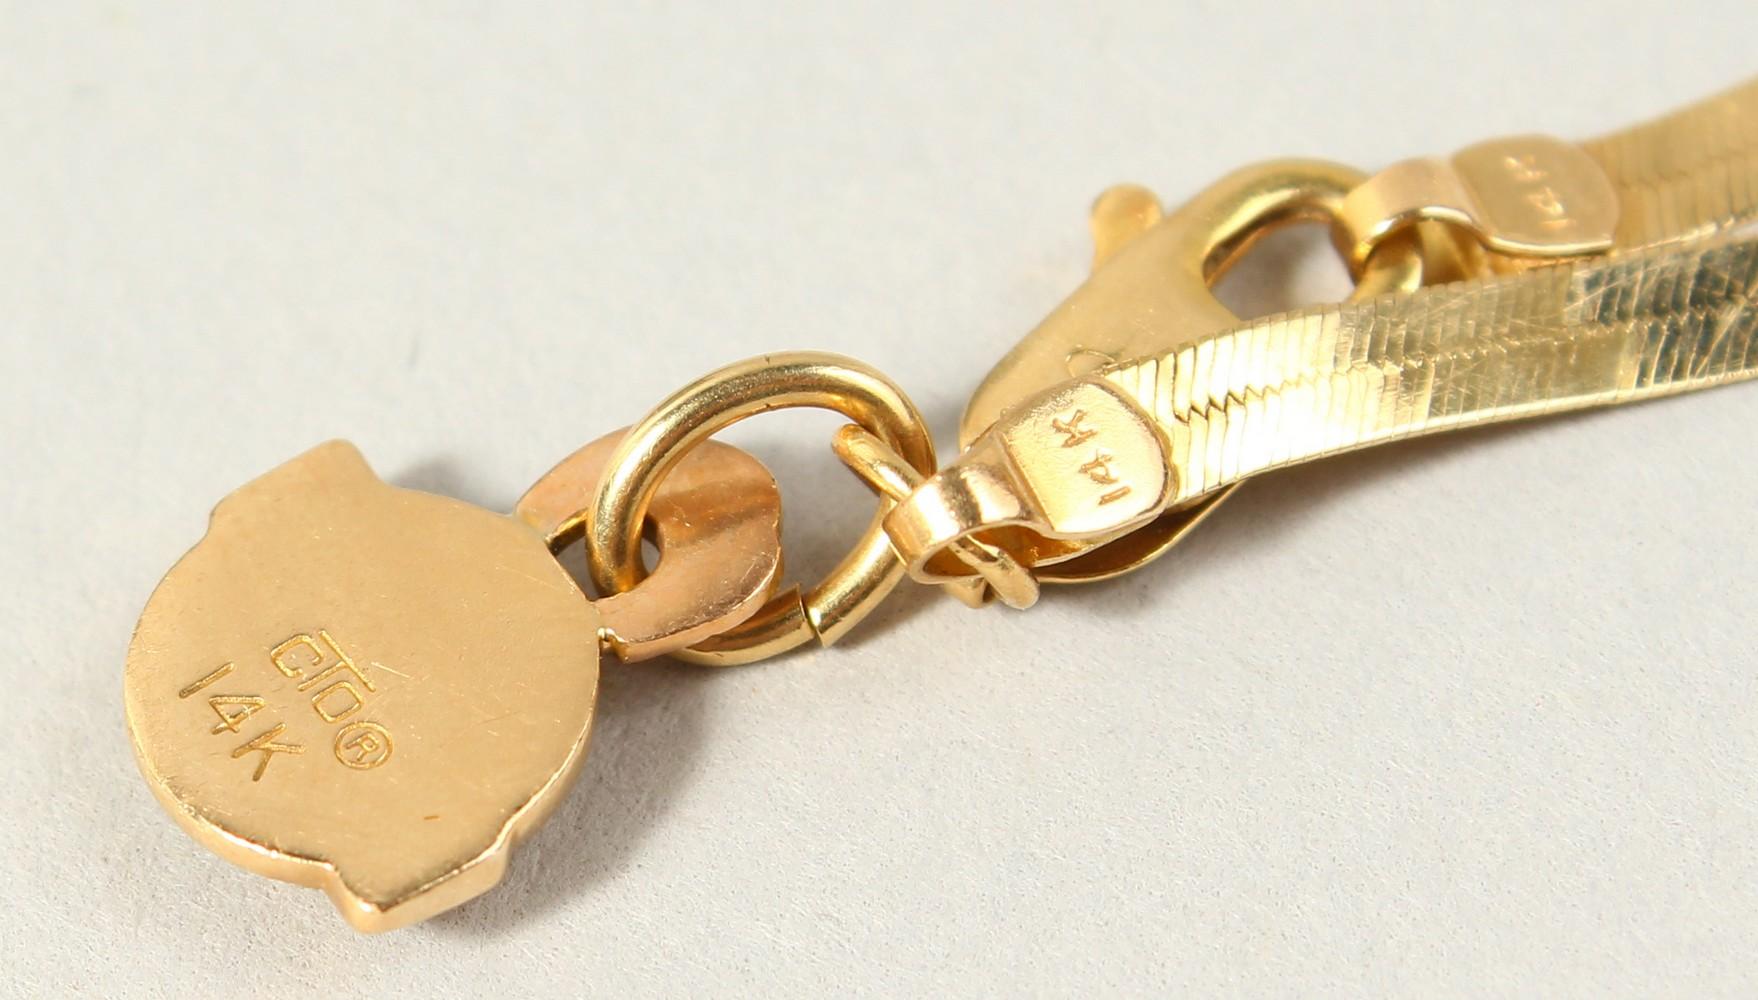 Lot 1742 - A 14K BECHTEL GOLD BRACELET, 2.9gms.